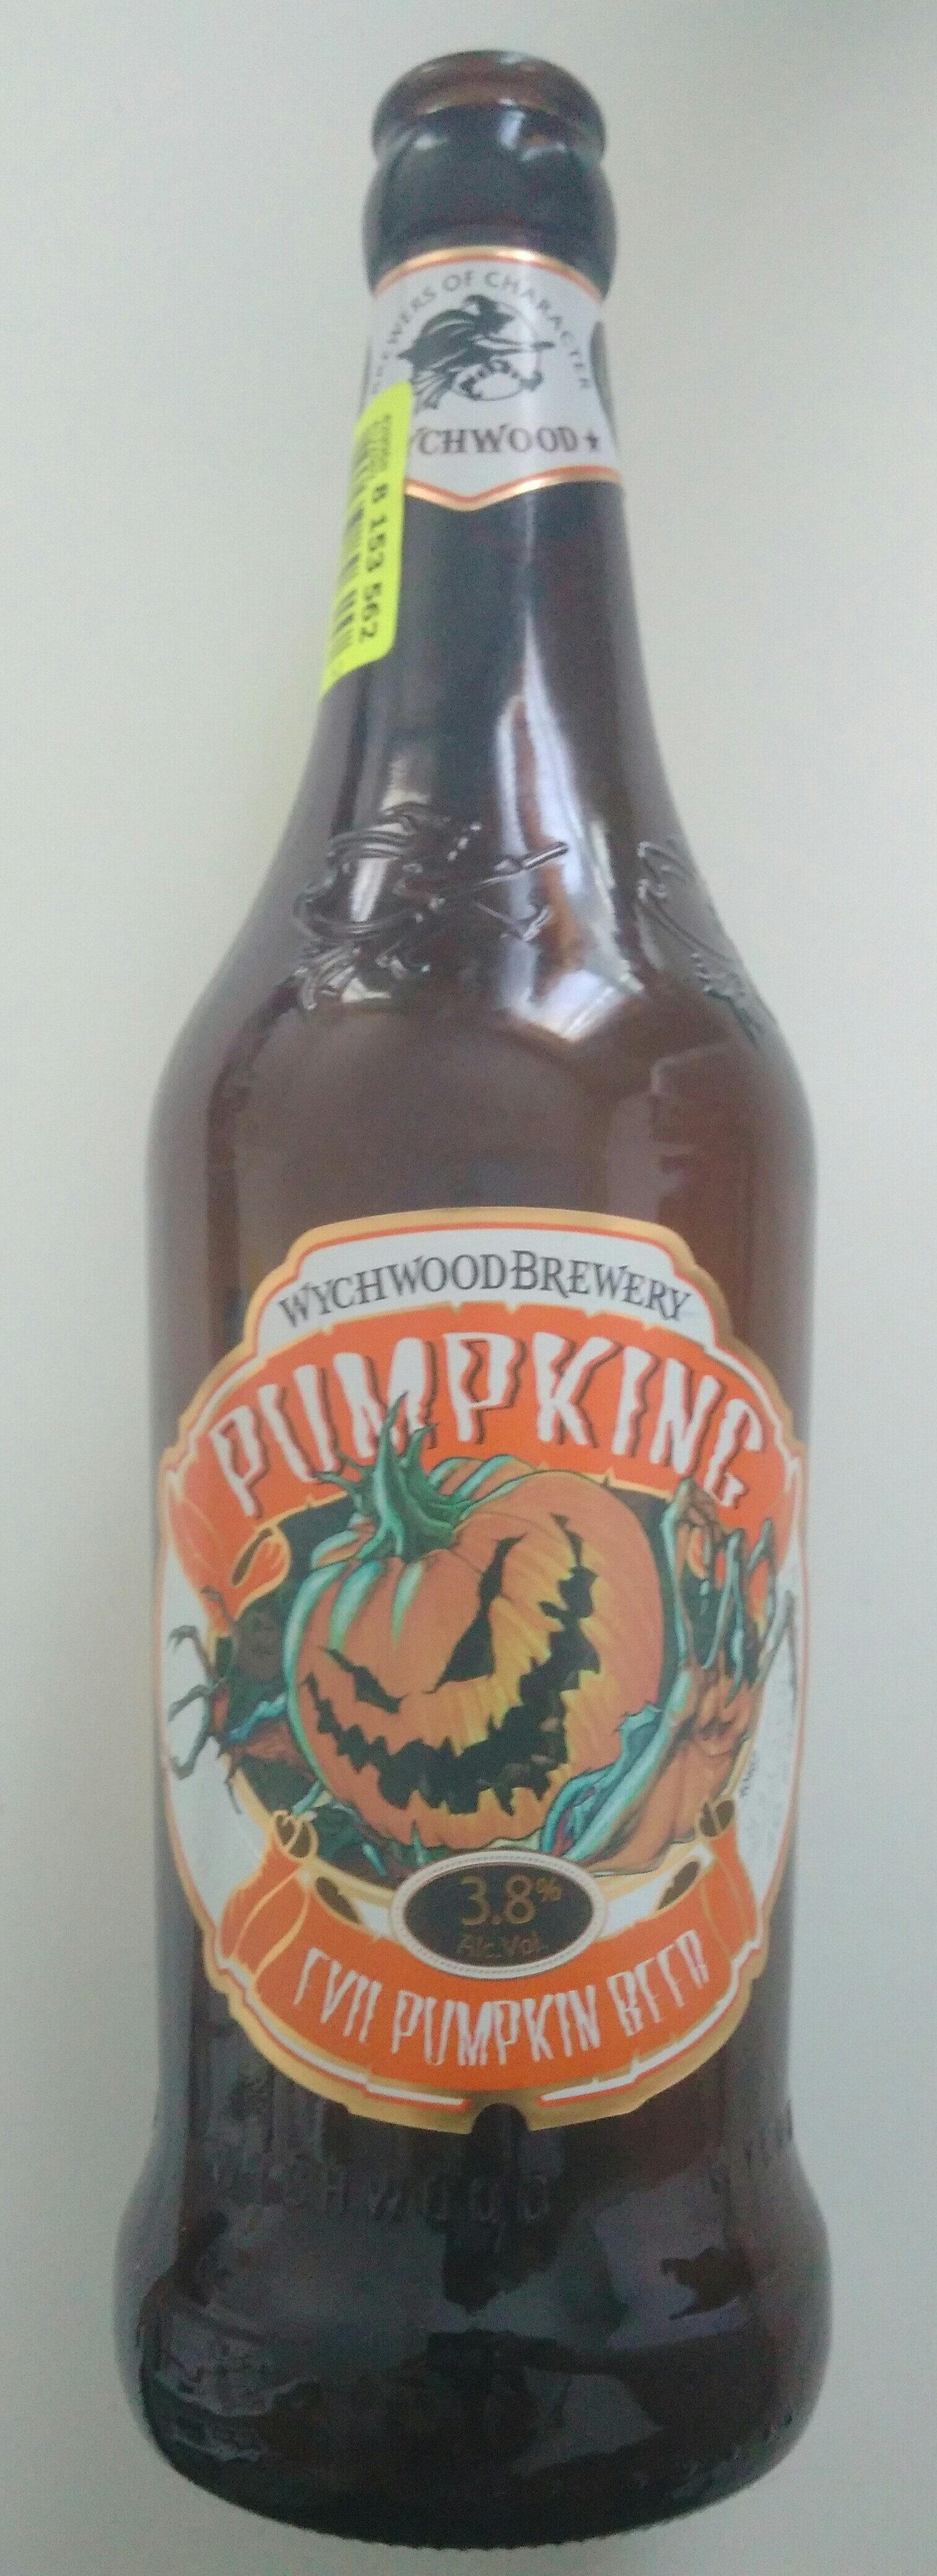 Pumpking evil pumpkin beer - Prodotto - fr